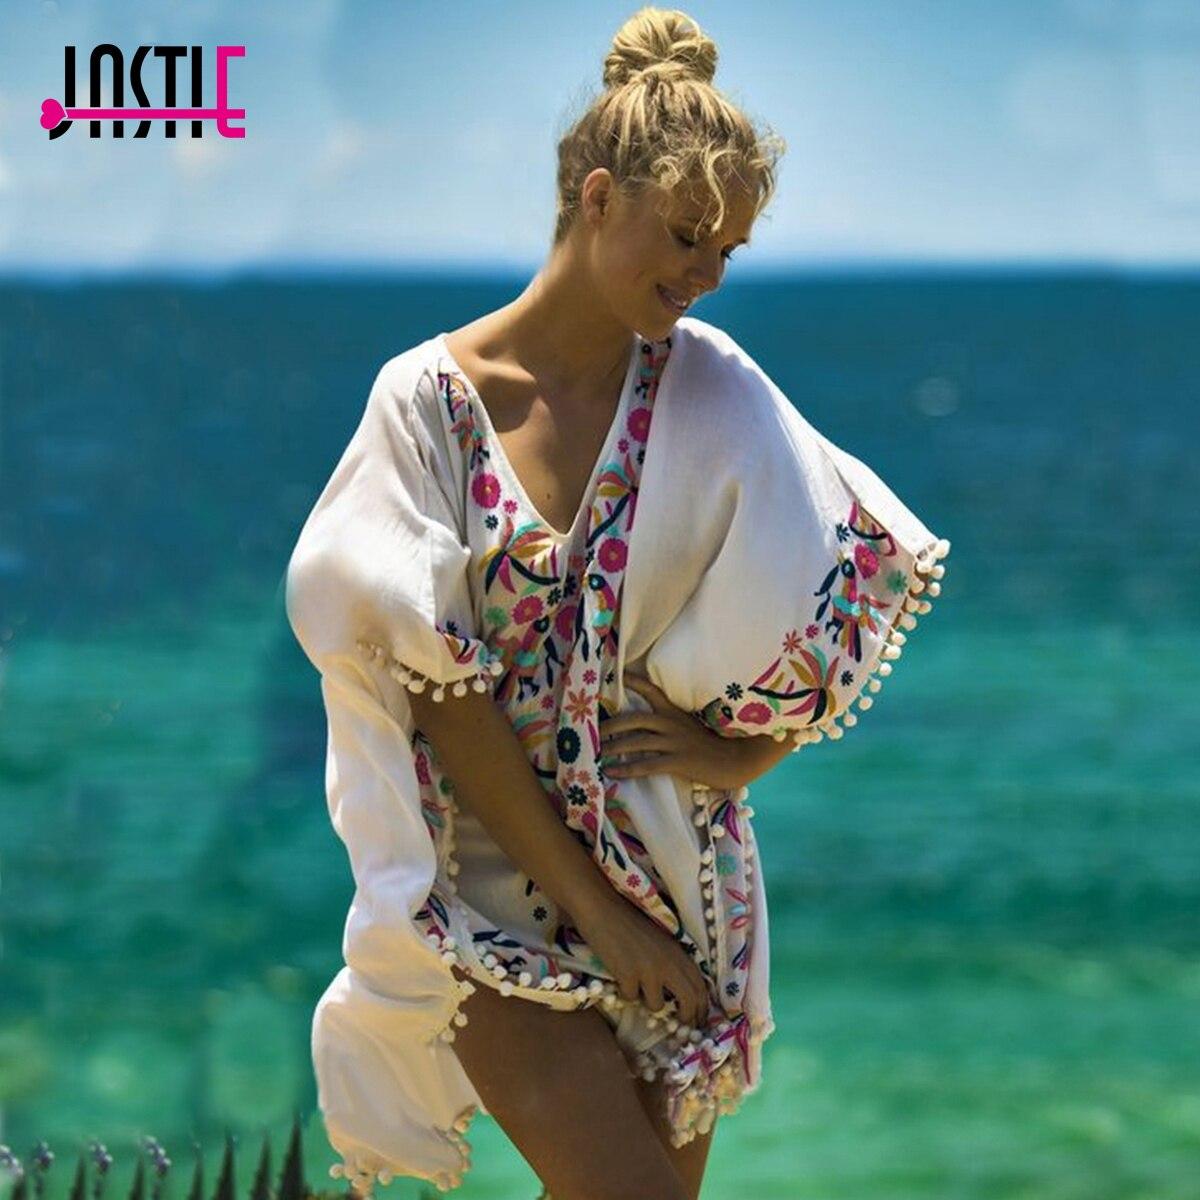 Jastie V-Neck Floral Embroidered Caftan Dress Summer Beach Vestidos Batwing Sleeve High-Low Hem Boho Loose Women Dresses floral v neck high low dress